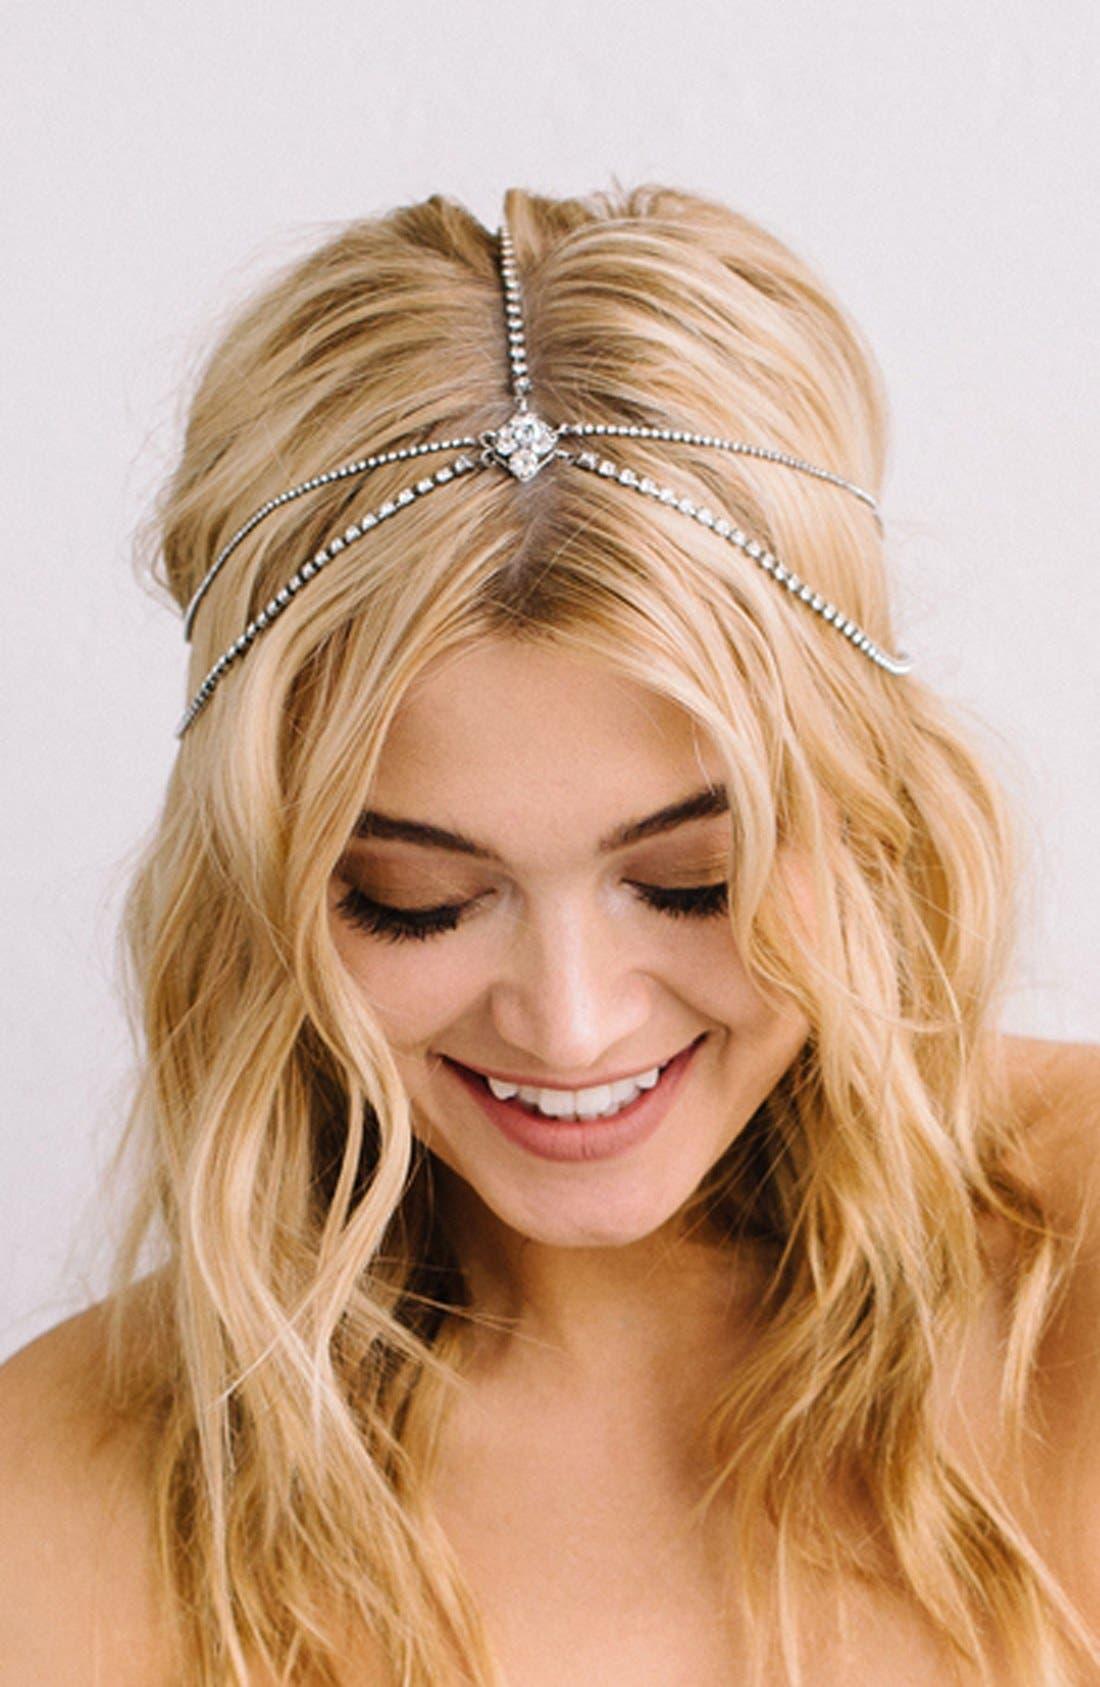 'Lindsay' Embellished Hair Chain,                             Alternate thumbnail 2, color,